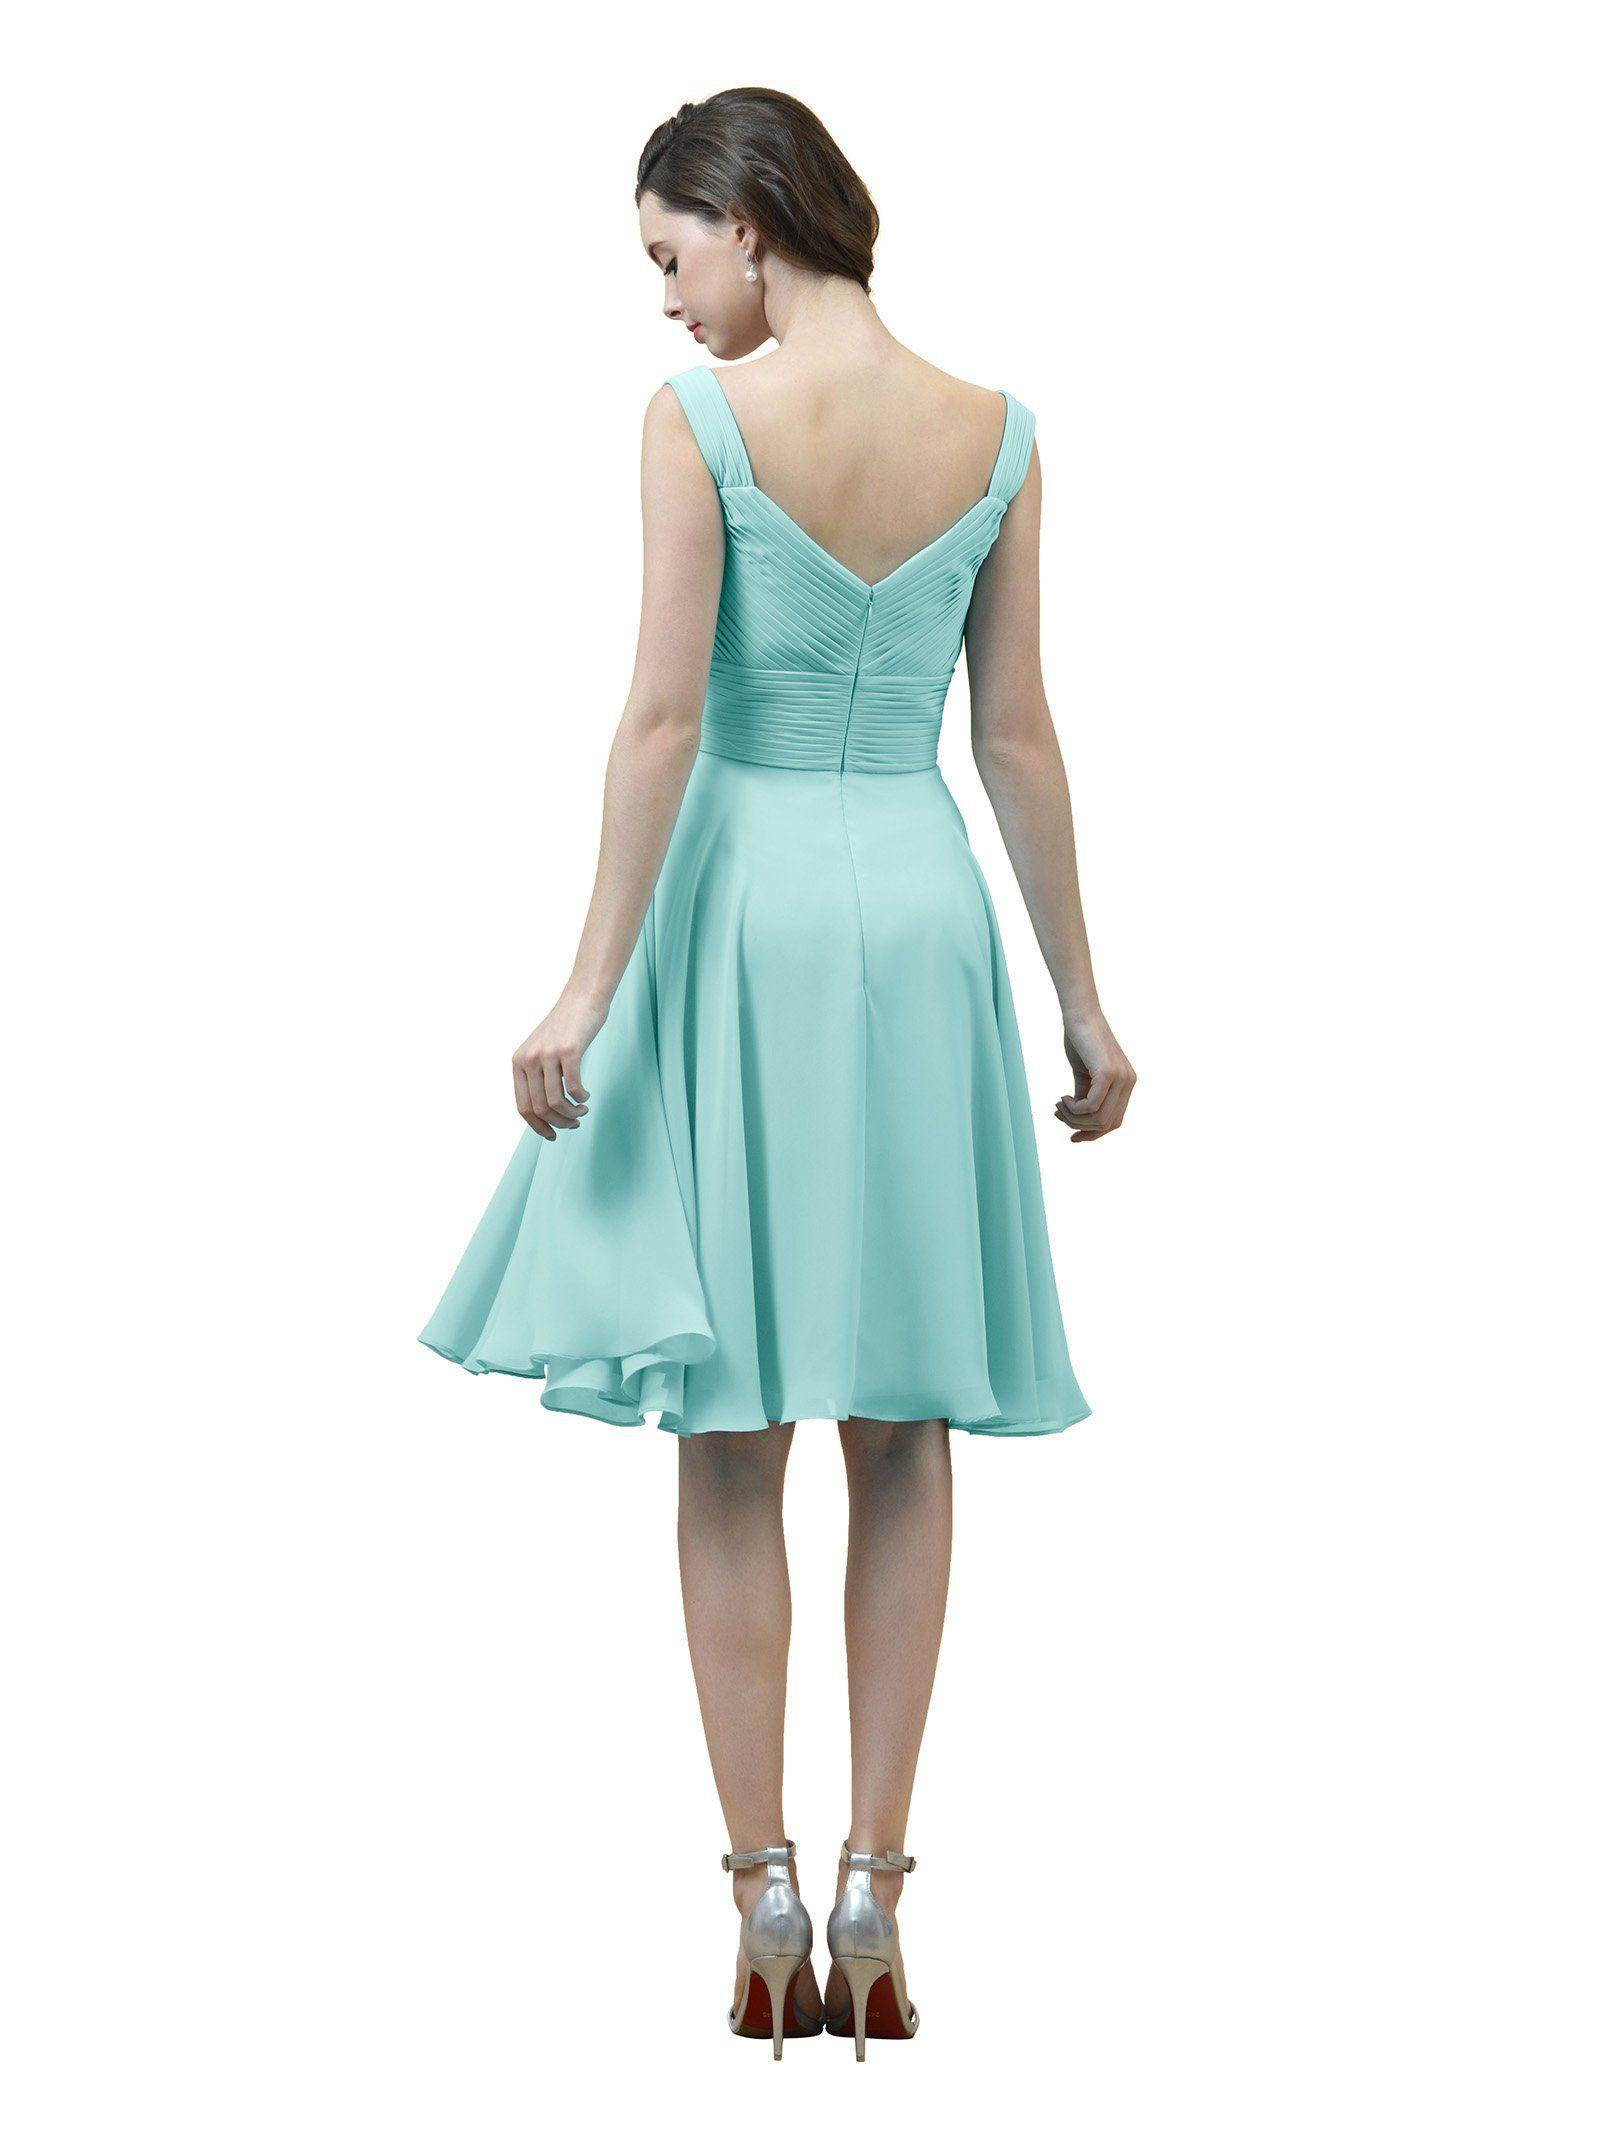 Alicepub short chiffon bridesmaid dress aline party prom gown